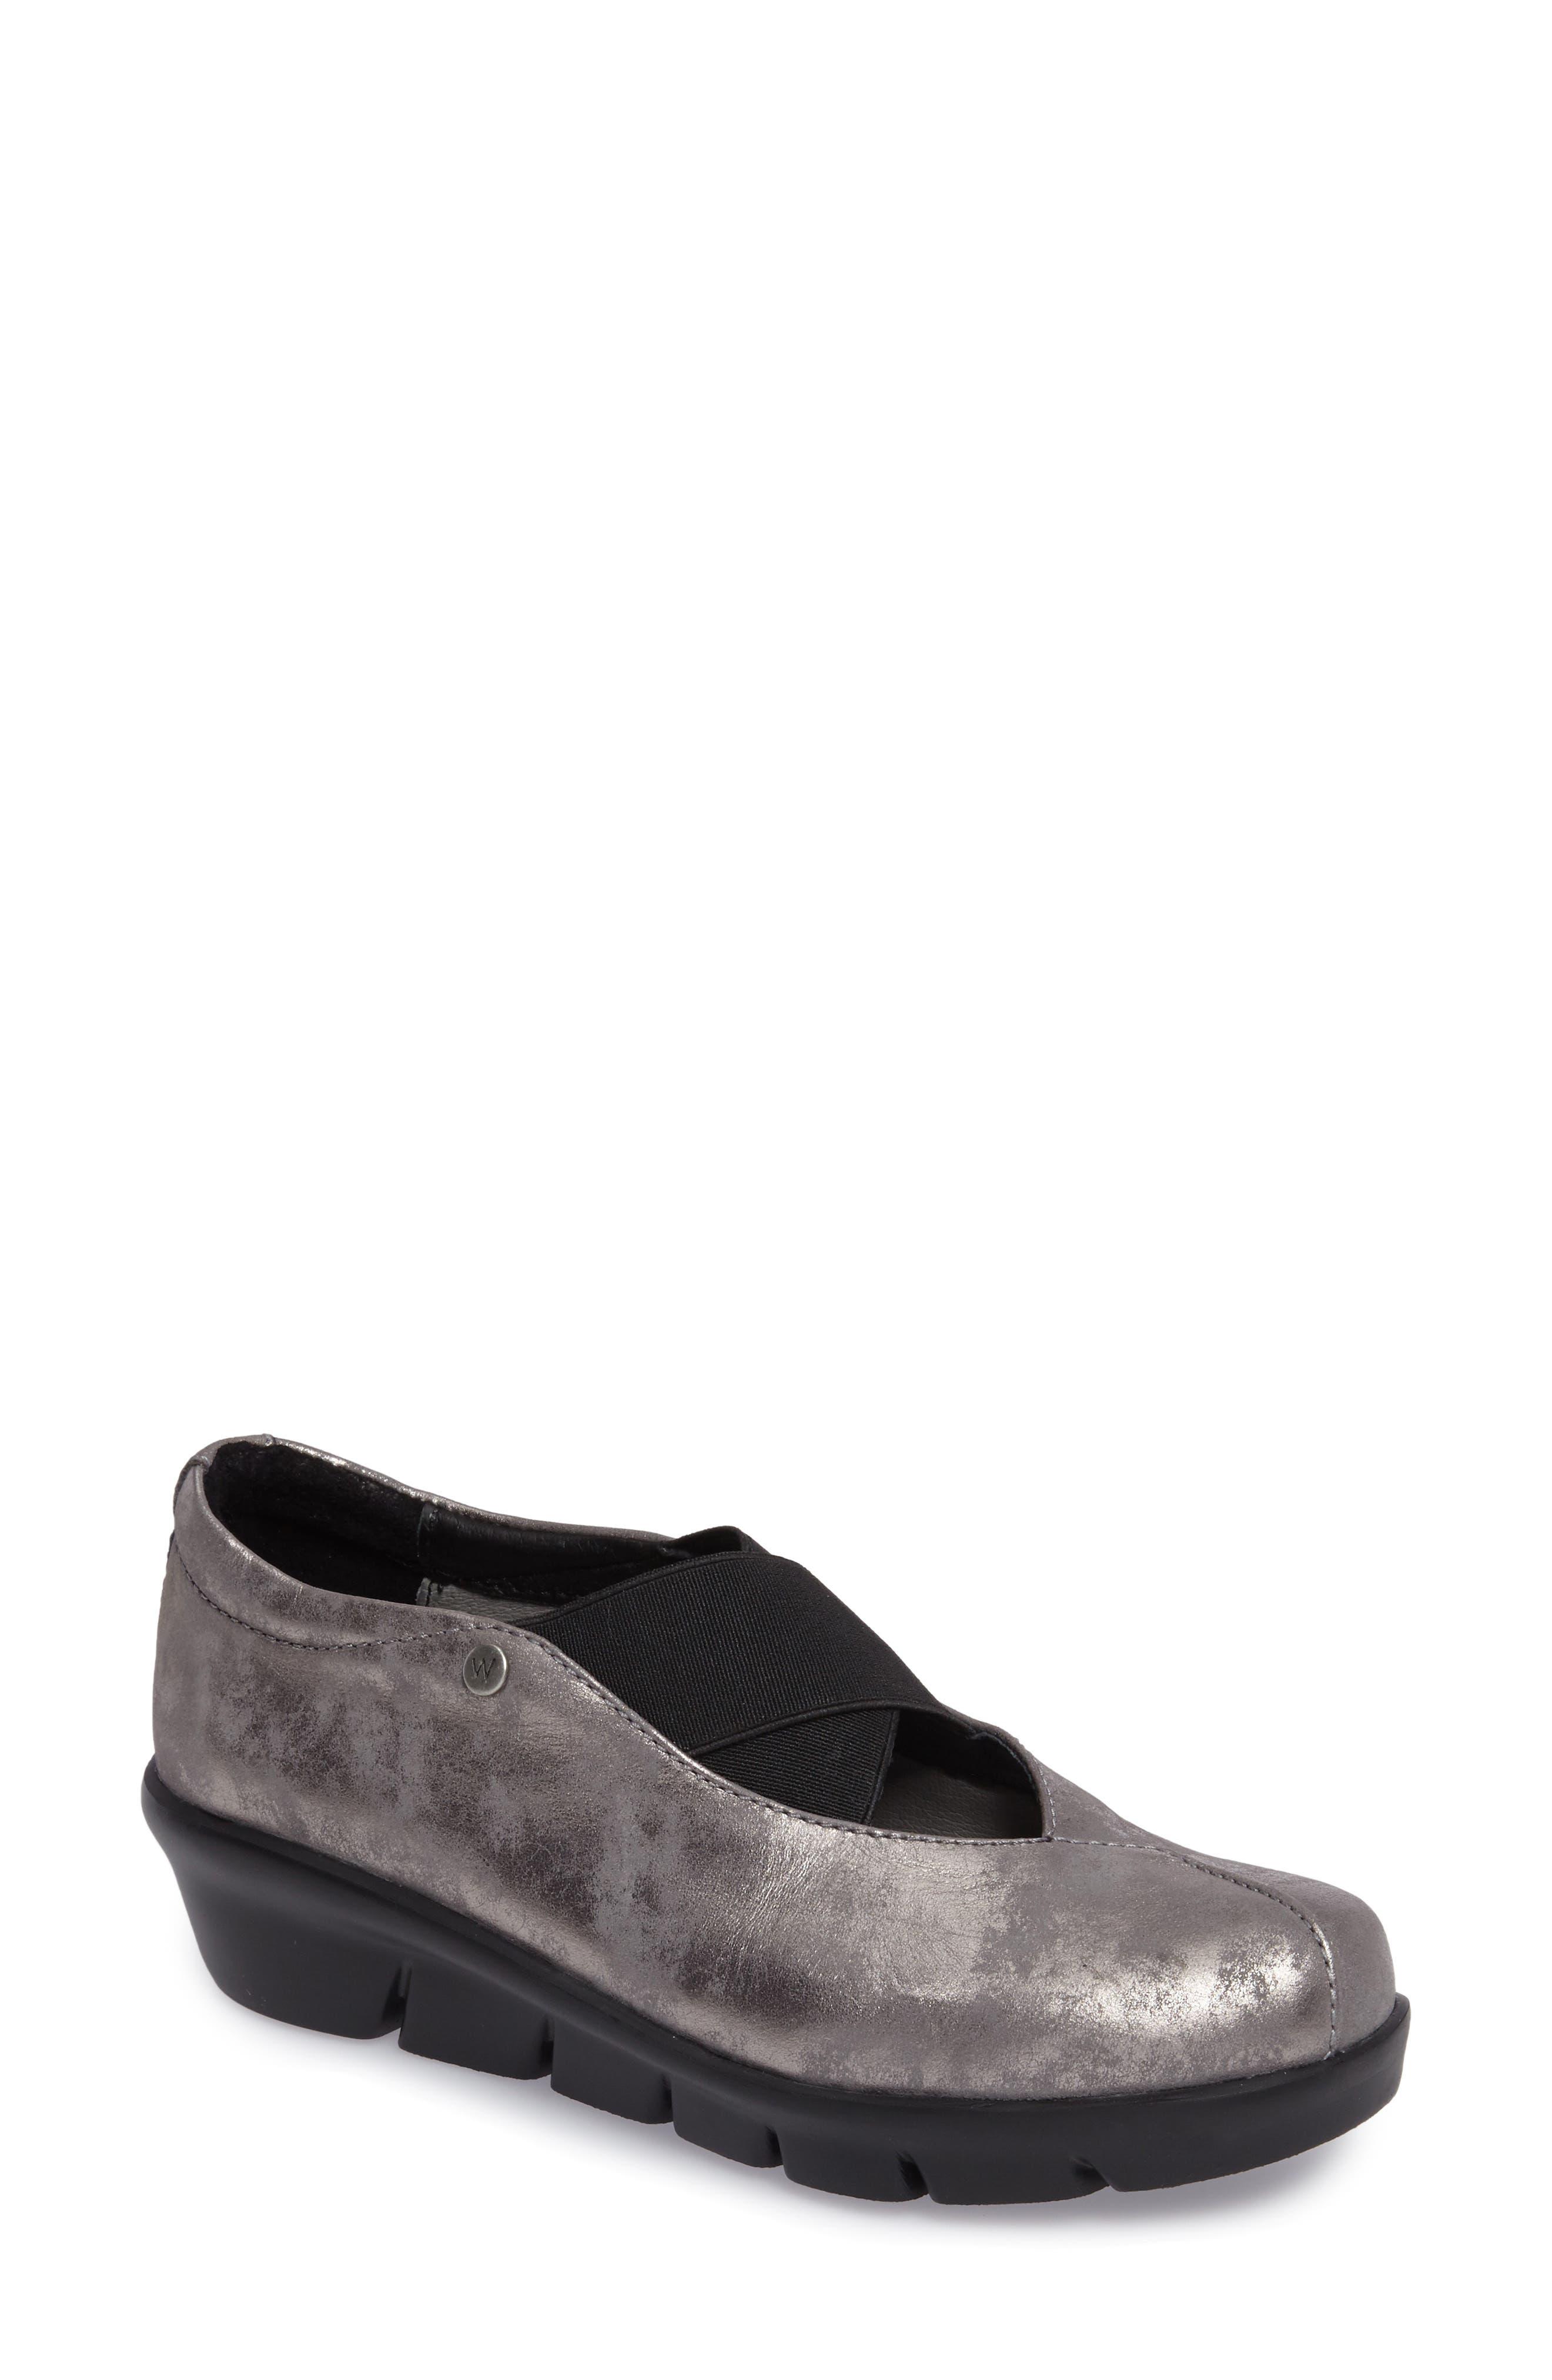 Alternate Image 1 Selected - Wolky Cursa Slip-On Sneaker (Women)